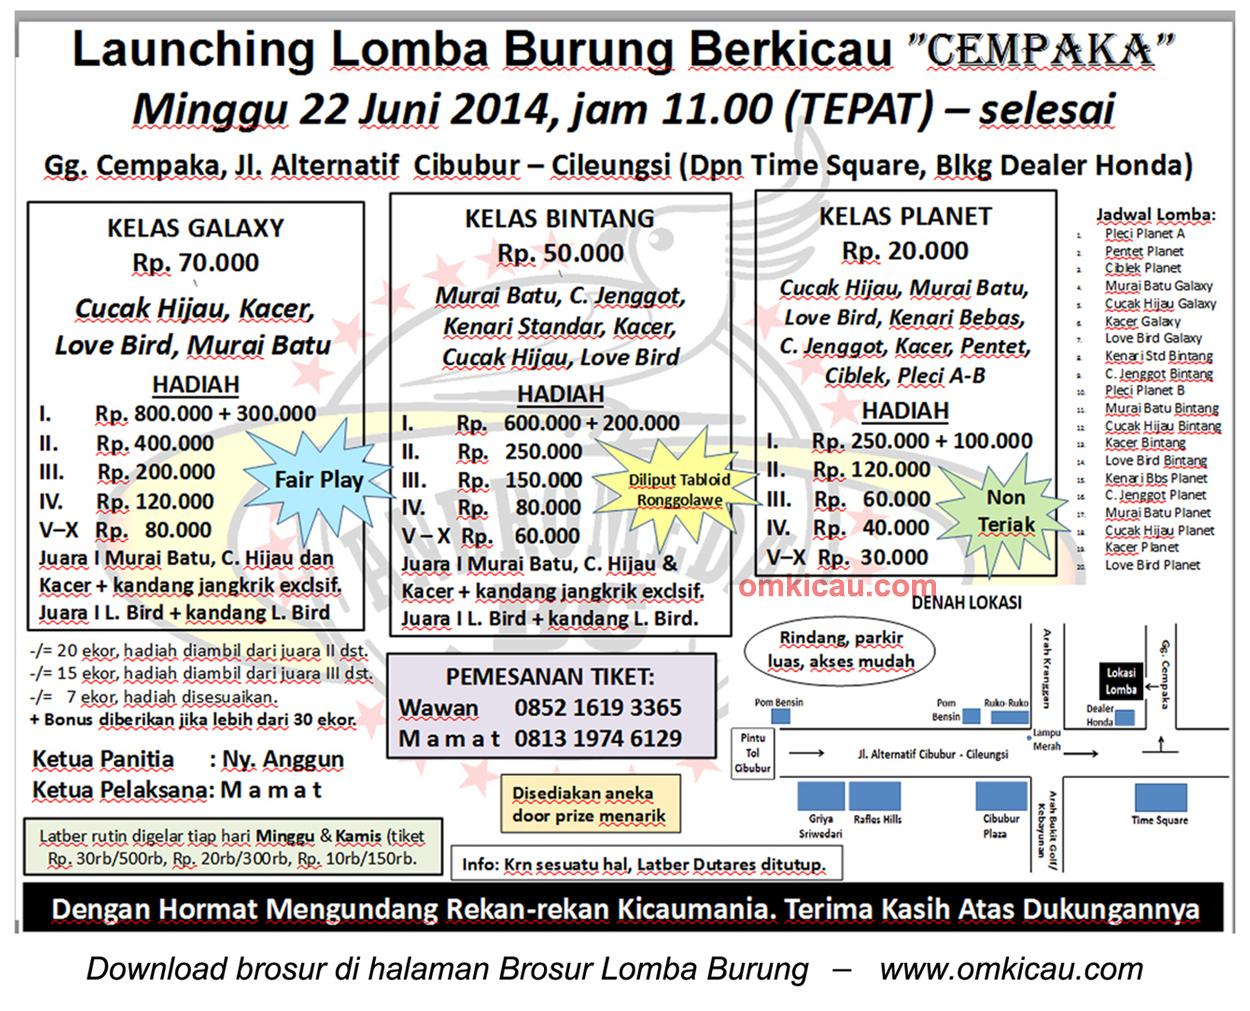 Brosur Lomba Burung Launching Cempaka, Bogor, 22 Juni 2014